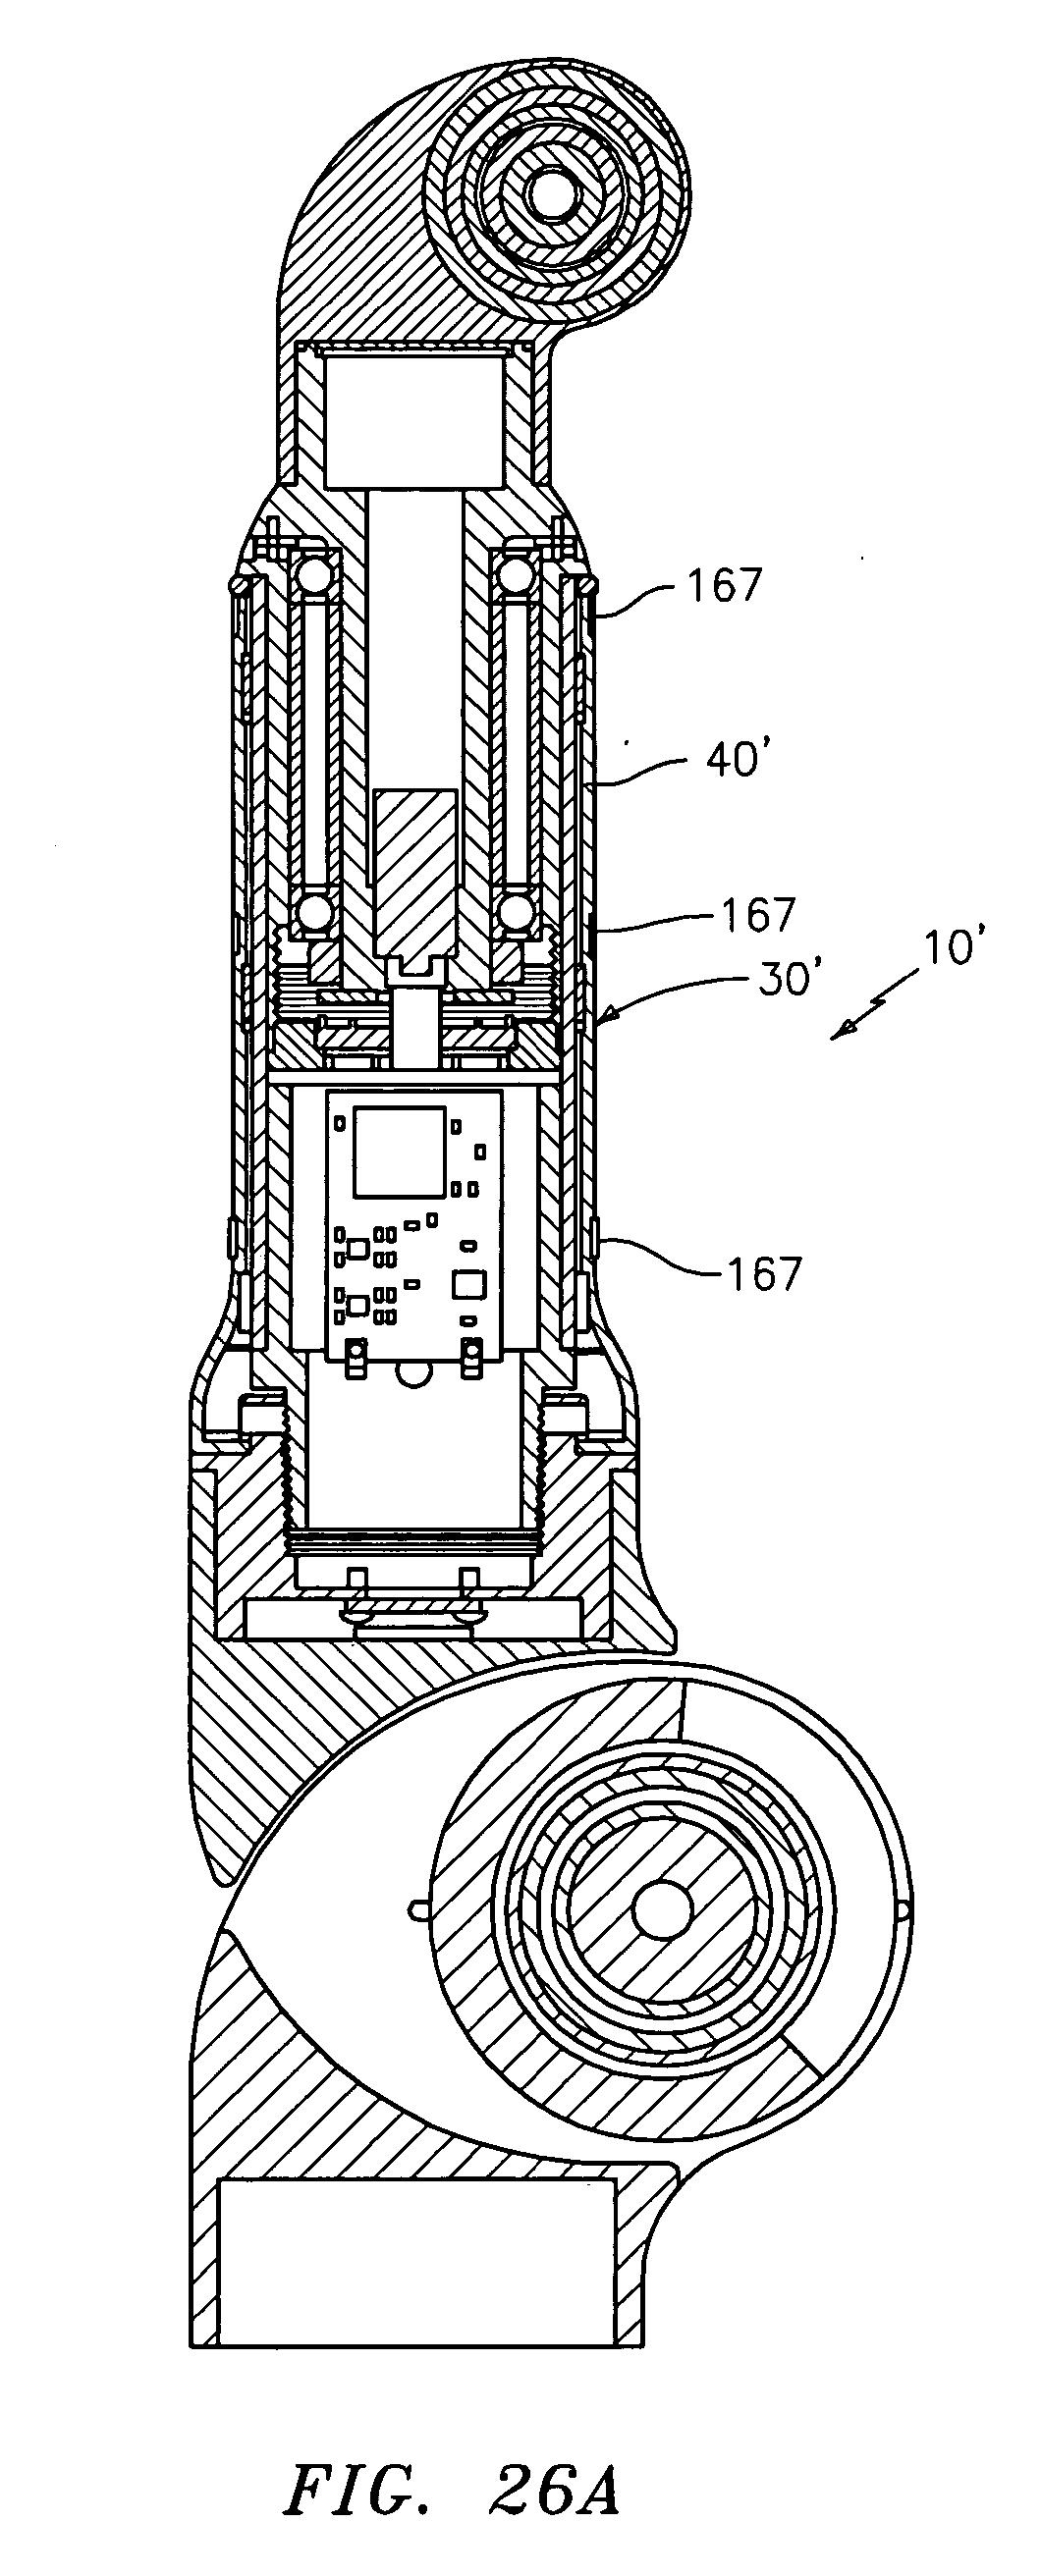 coordinate measurement machine